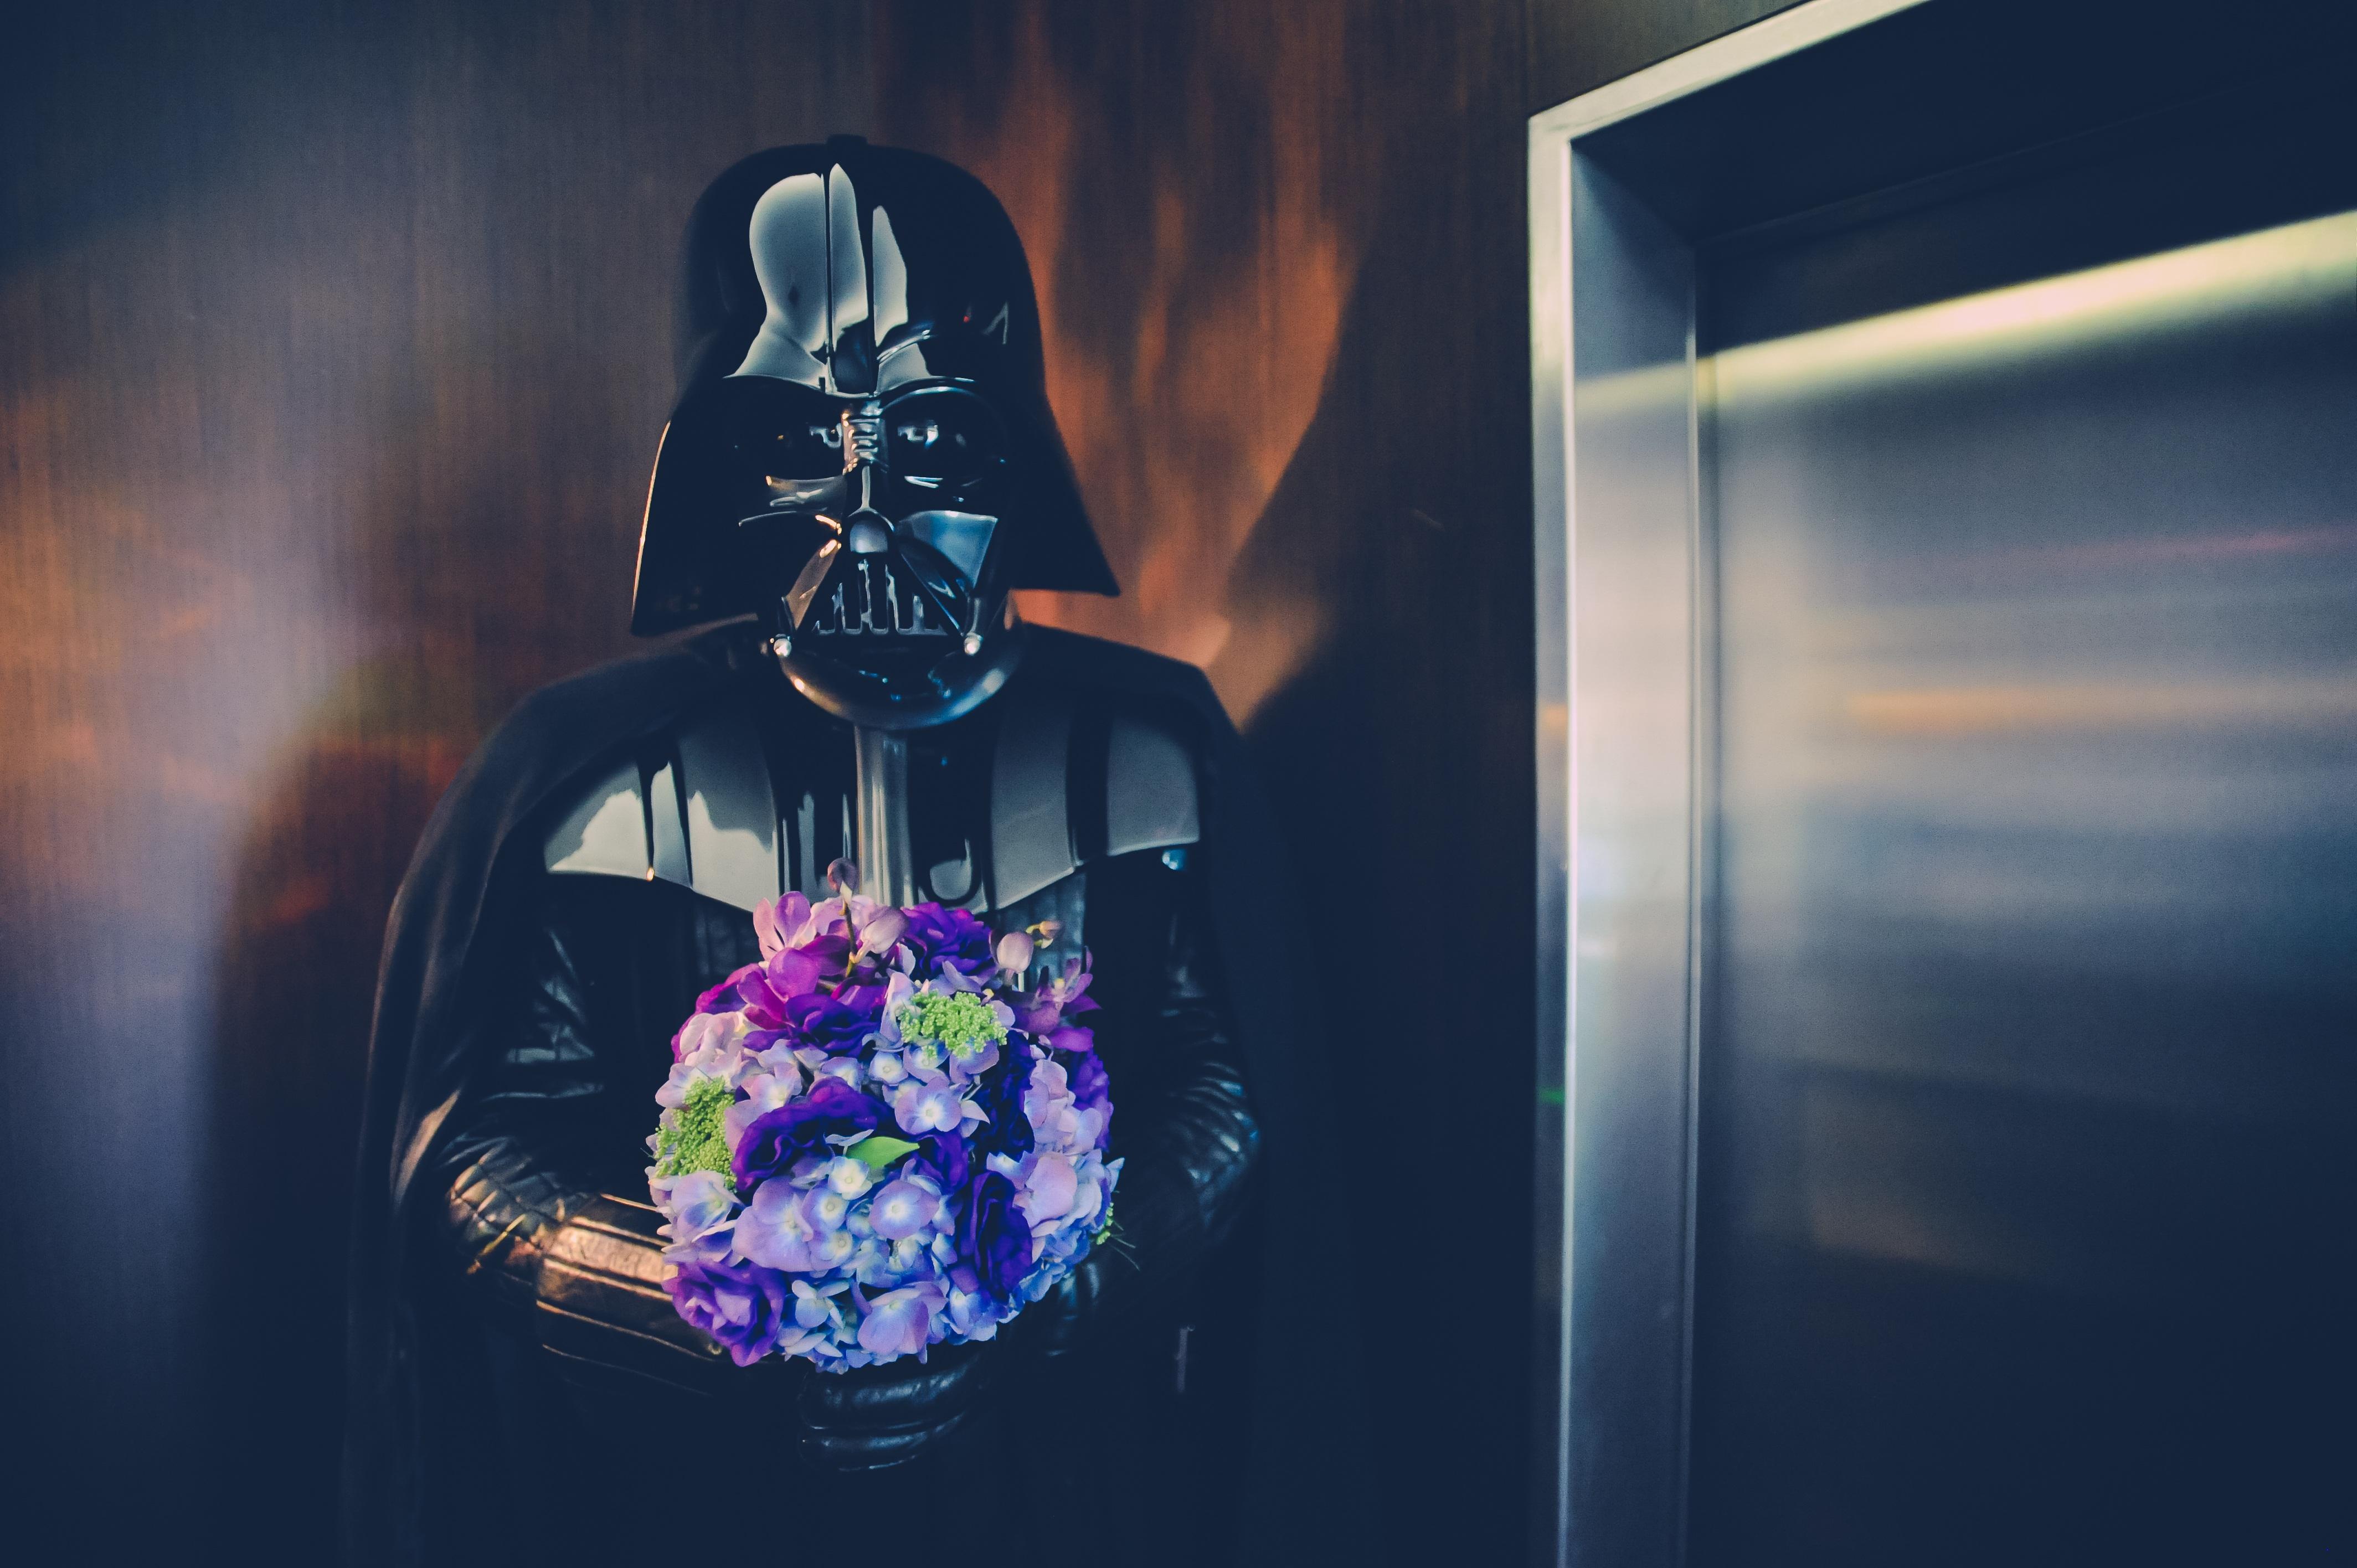 Light Photography Flower Dark Soldier Color Darkness Blue Wedding Star Wars Lift Photograph Elevator Screenshot Darth